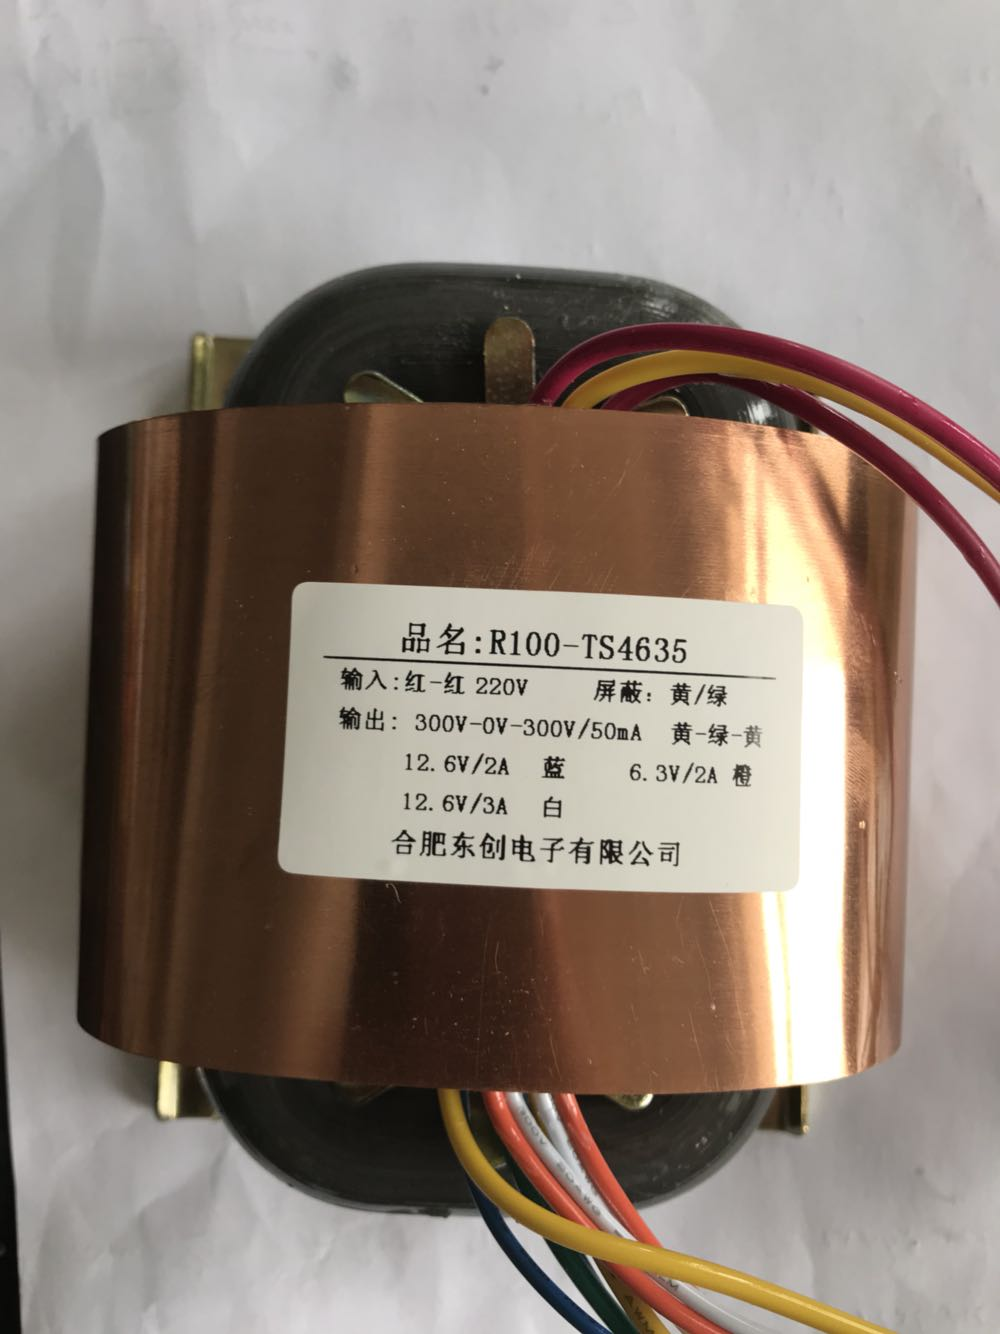 300V-0-300V 50mA 12.6V 3A 12.6V 2A 6.3V 2A R Core Transformer 100VA R100 custom transformer 220V copper shield Power amplifier цены онлайн